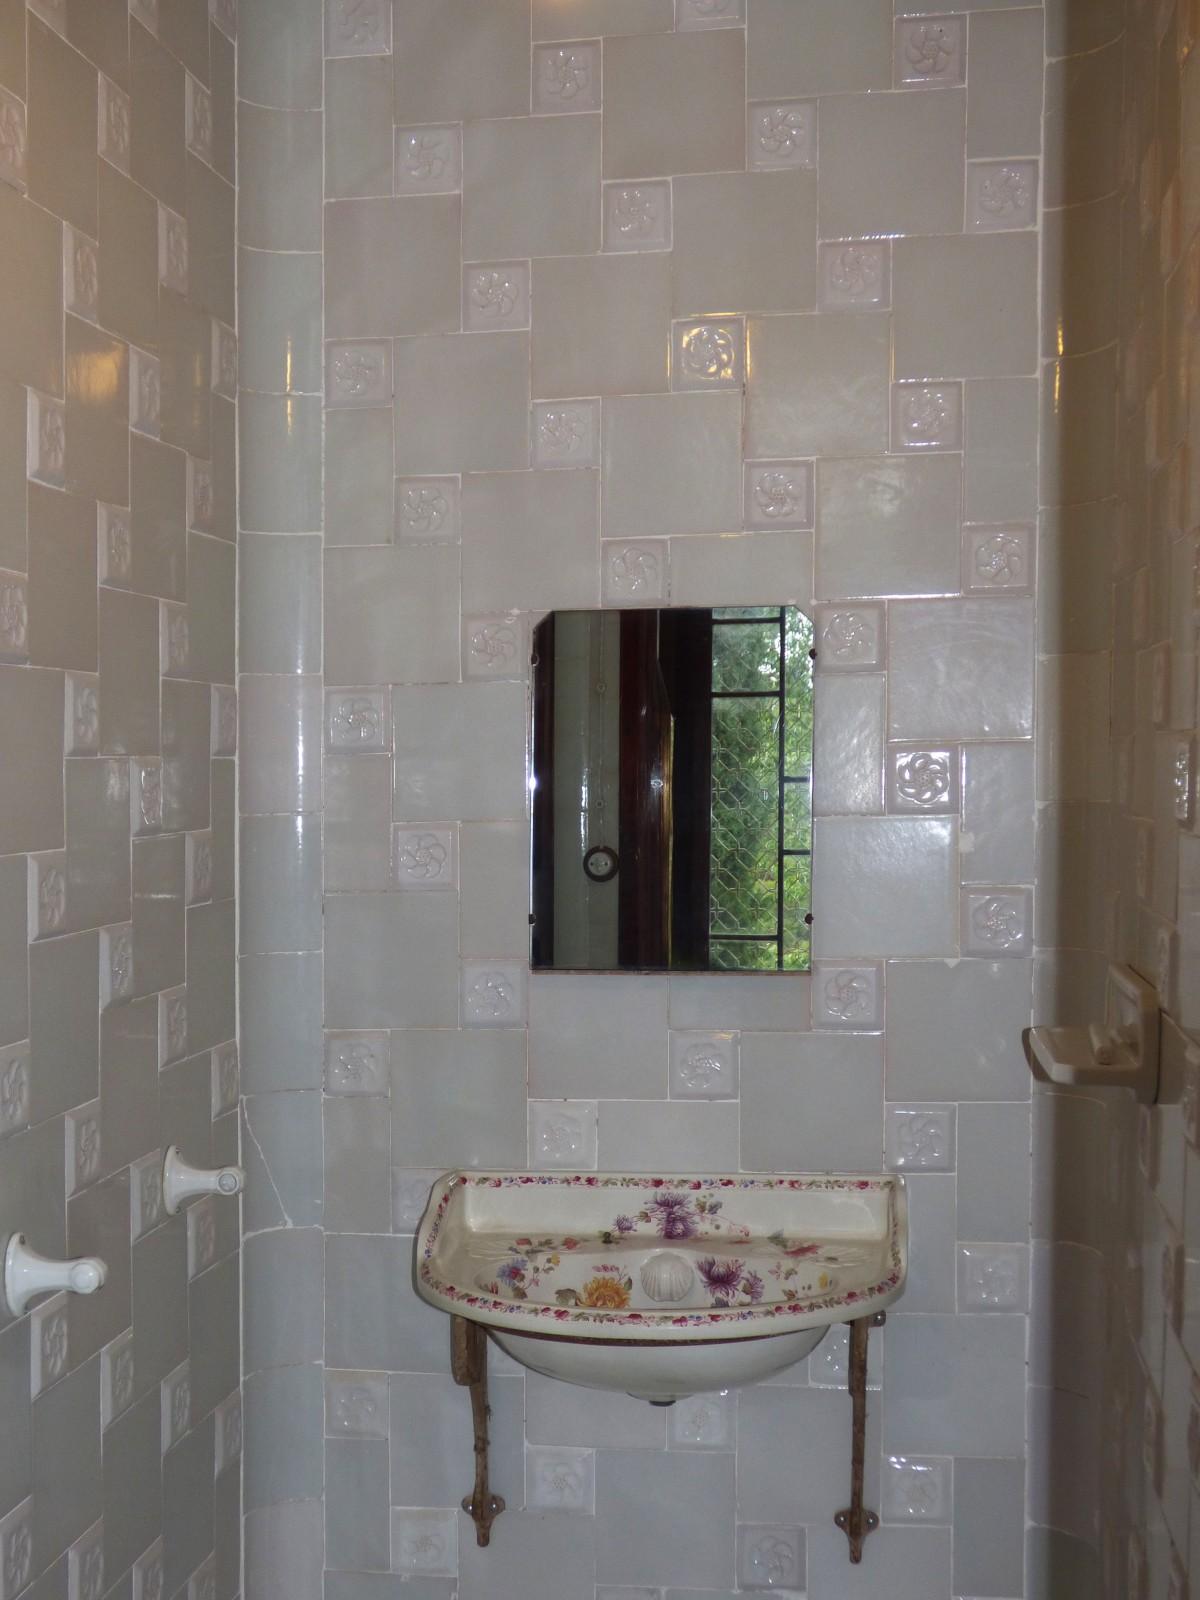 Fotos gratis : piso, antiguo, pared, azulejo, lavabo ... - photo#16